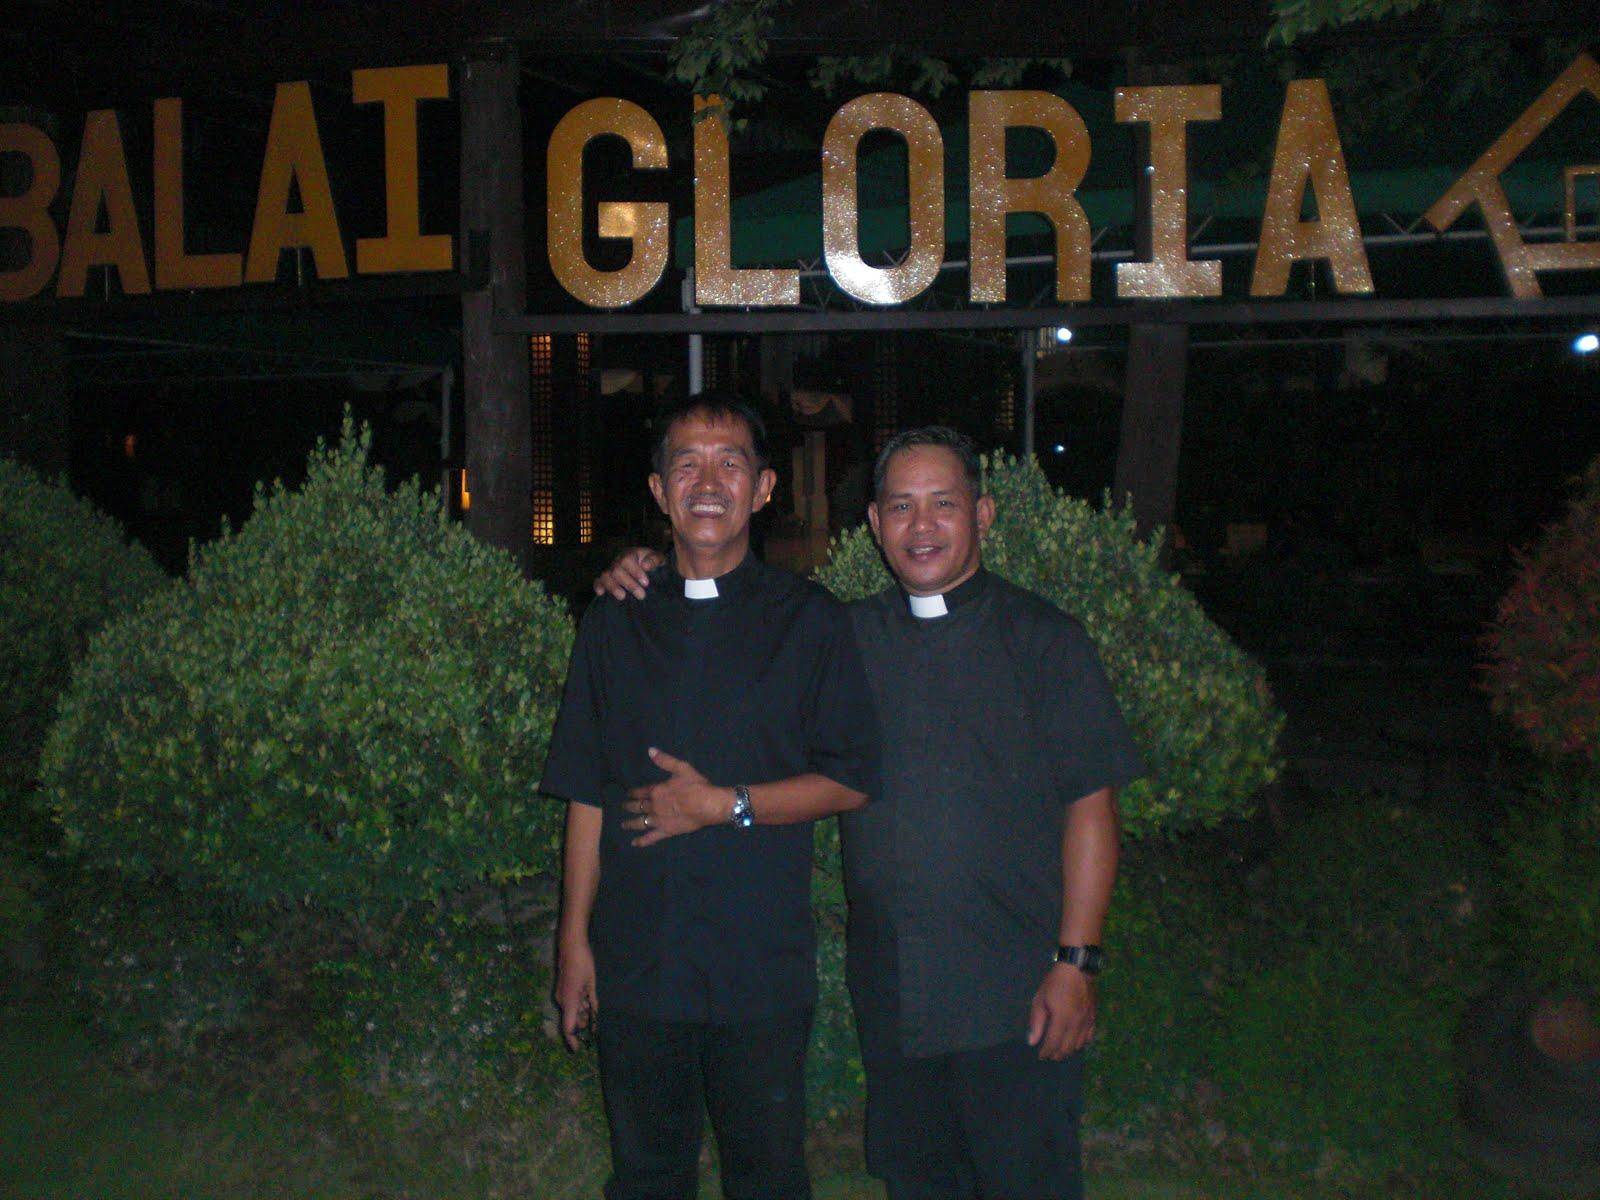 Rev.Fr. Robert C.Gerna and Rev.David S. Mundares